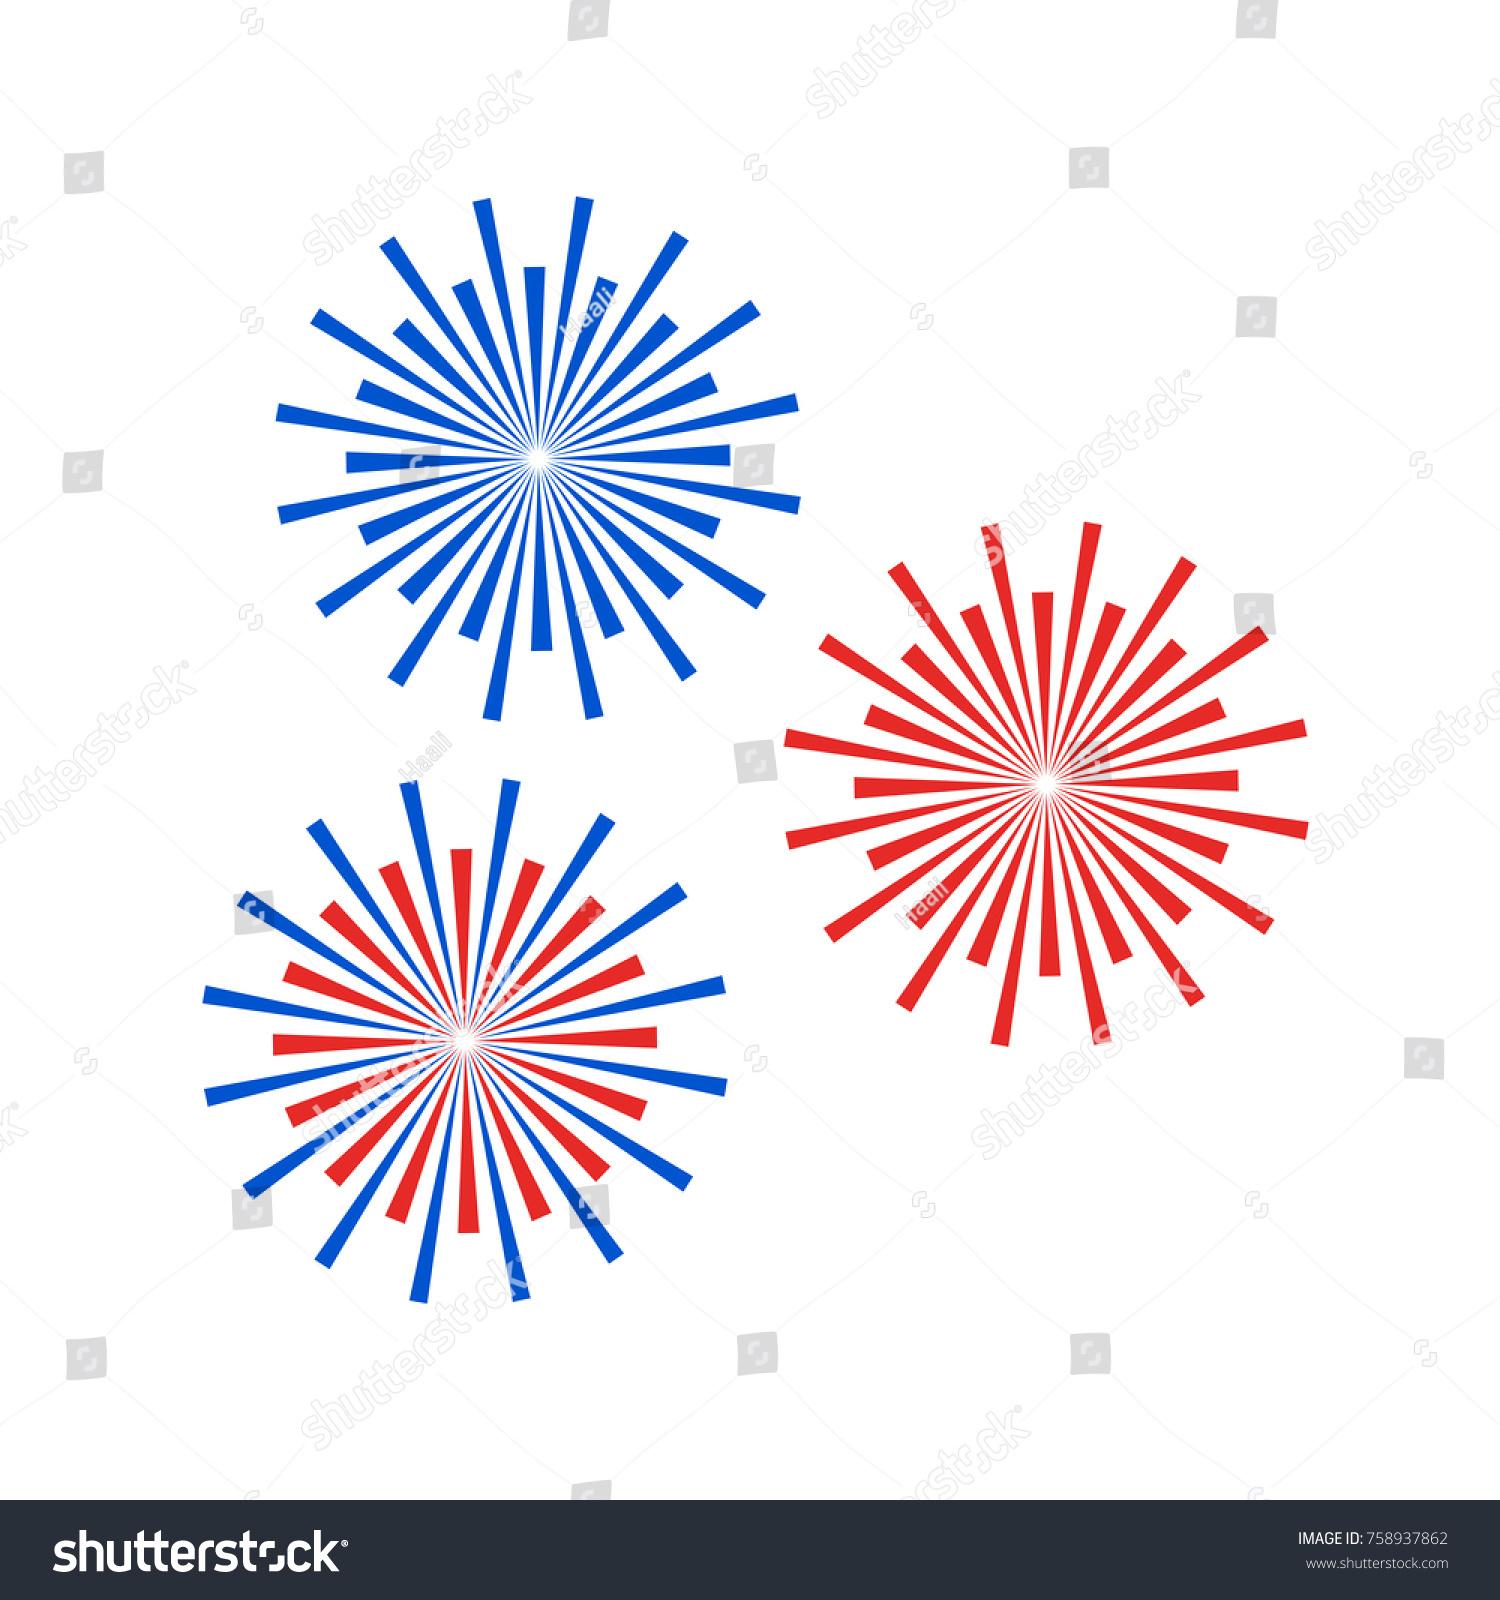 Colorful Minimalist Design: Colorful Firework Icon Flat Minimalist Design Stock Vector